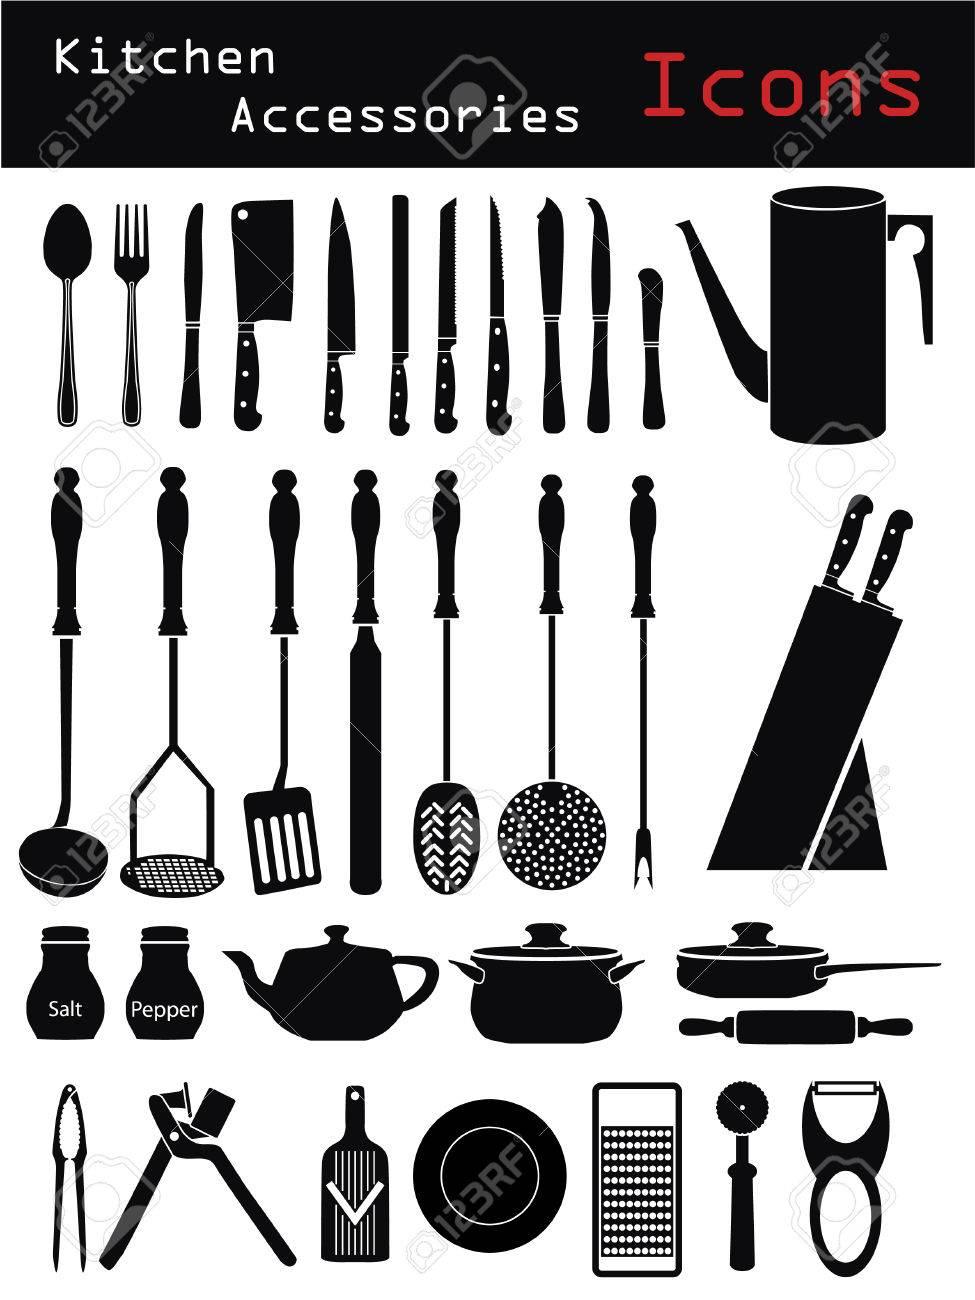 Kitchen Accessories Stock Vector - 6688217